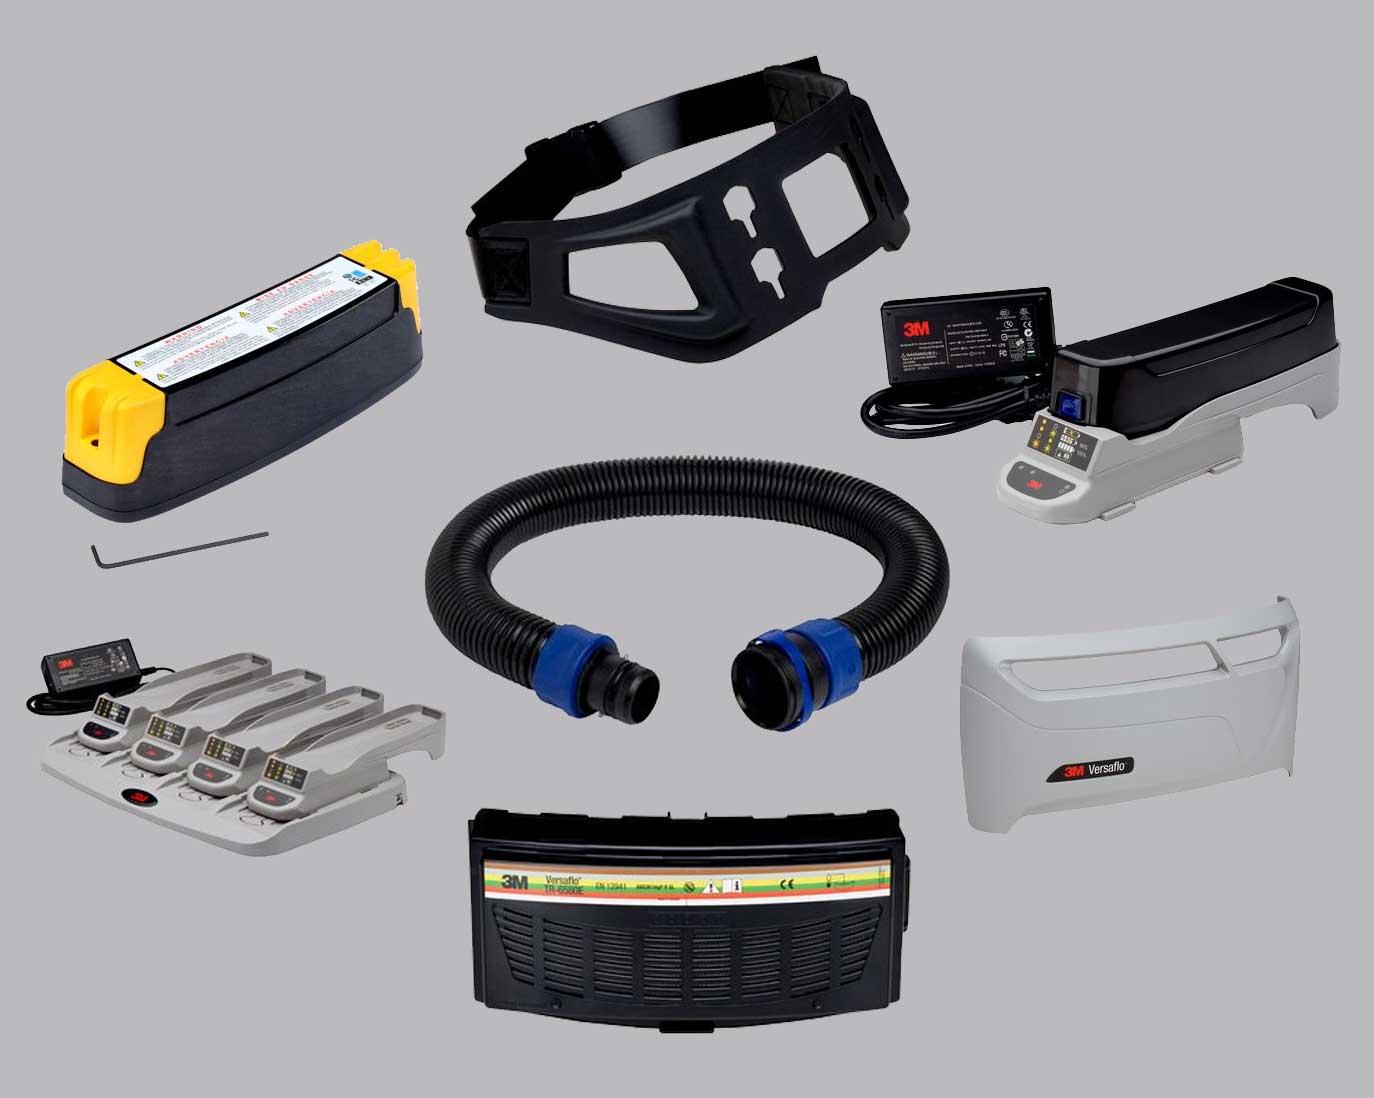 3M Versaflo - TR800 Intrinsically Safe Powered Air